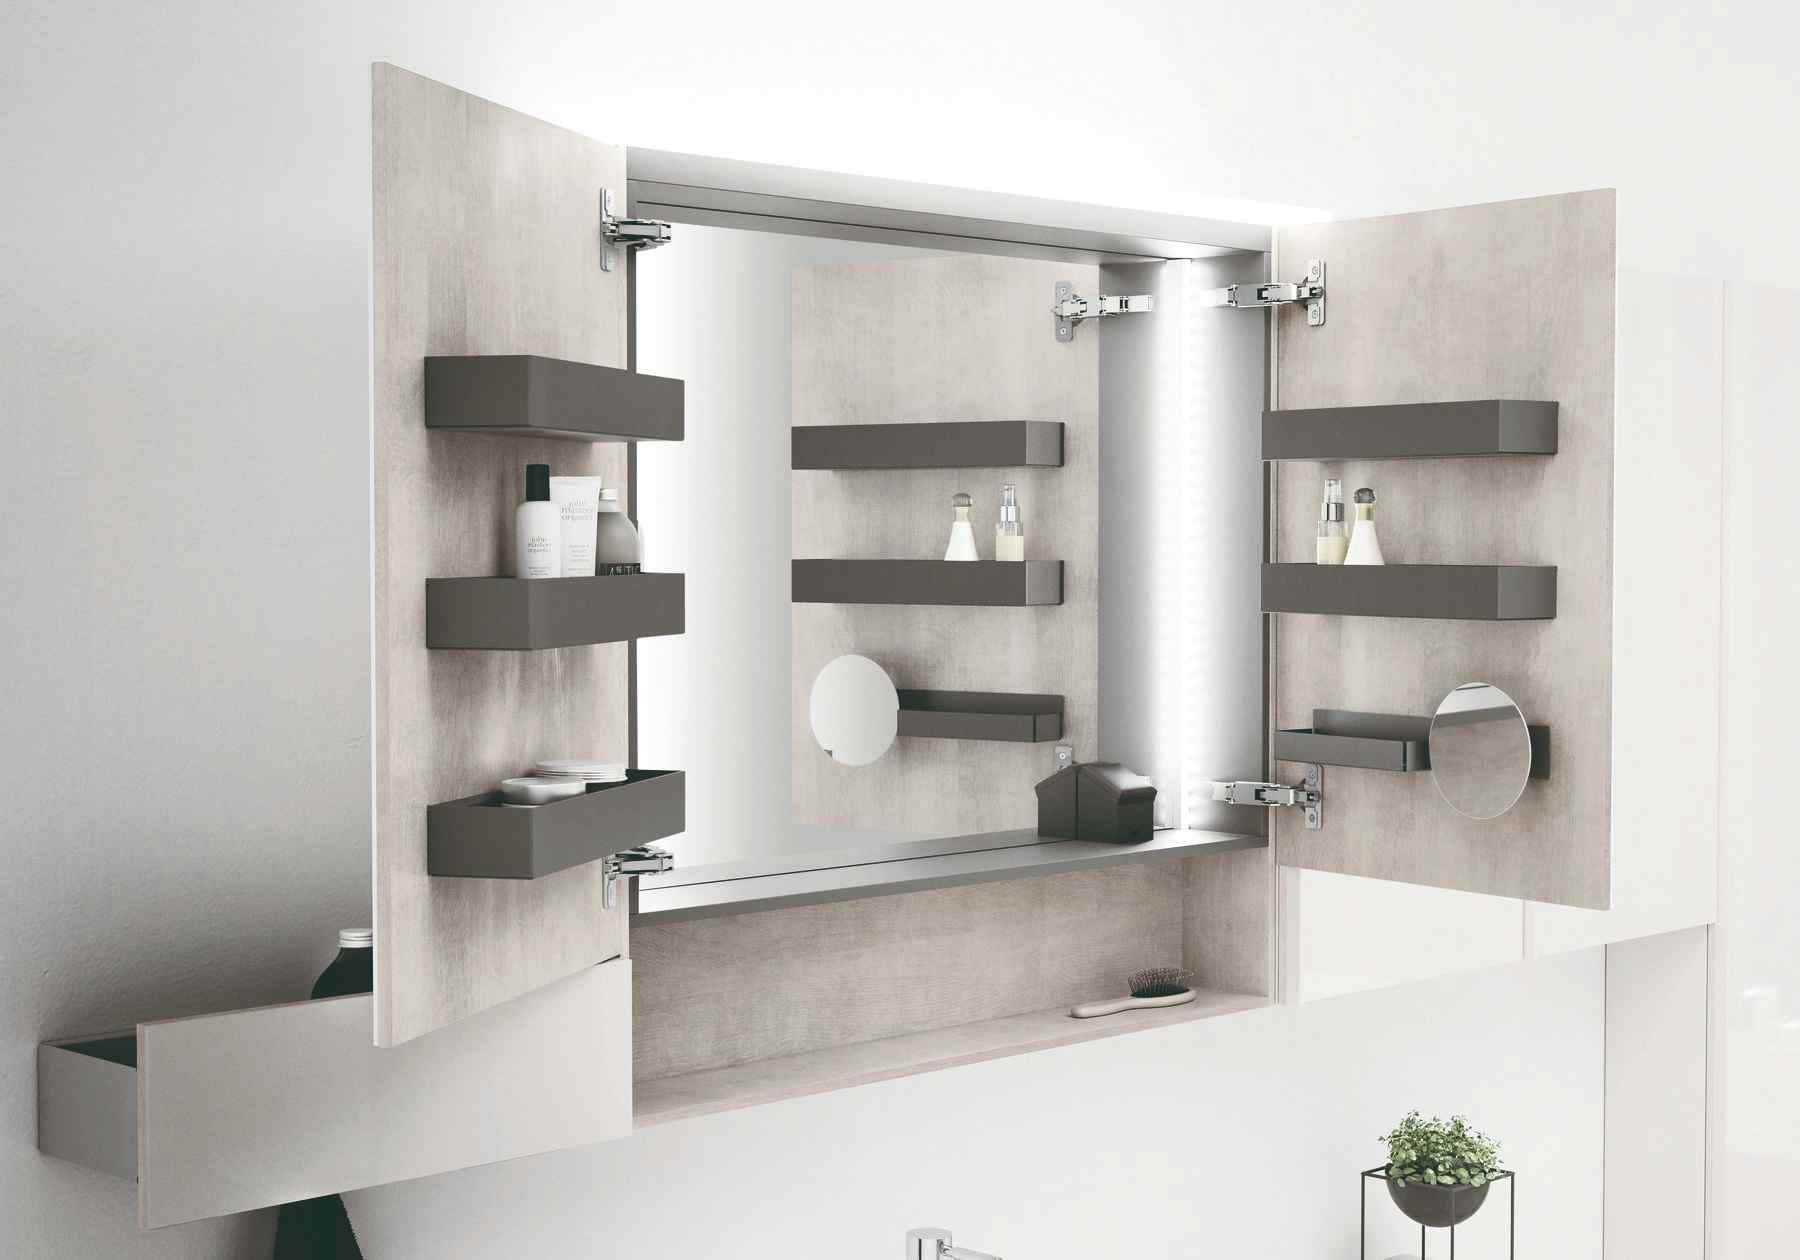 07_Geberit_2017 Bathroom 14 J Acanto